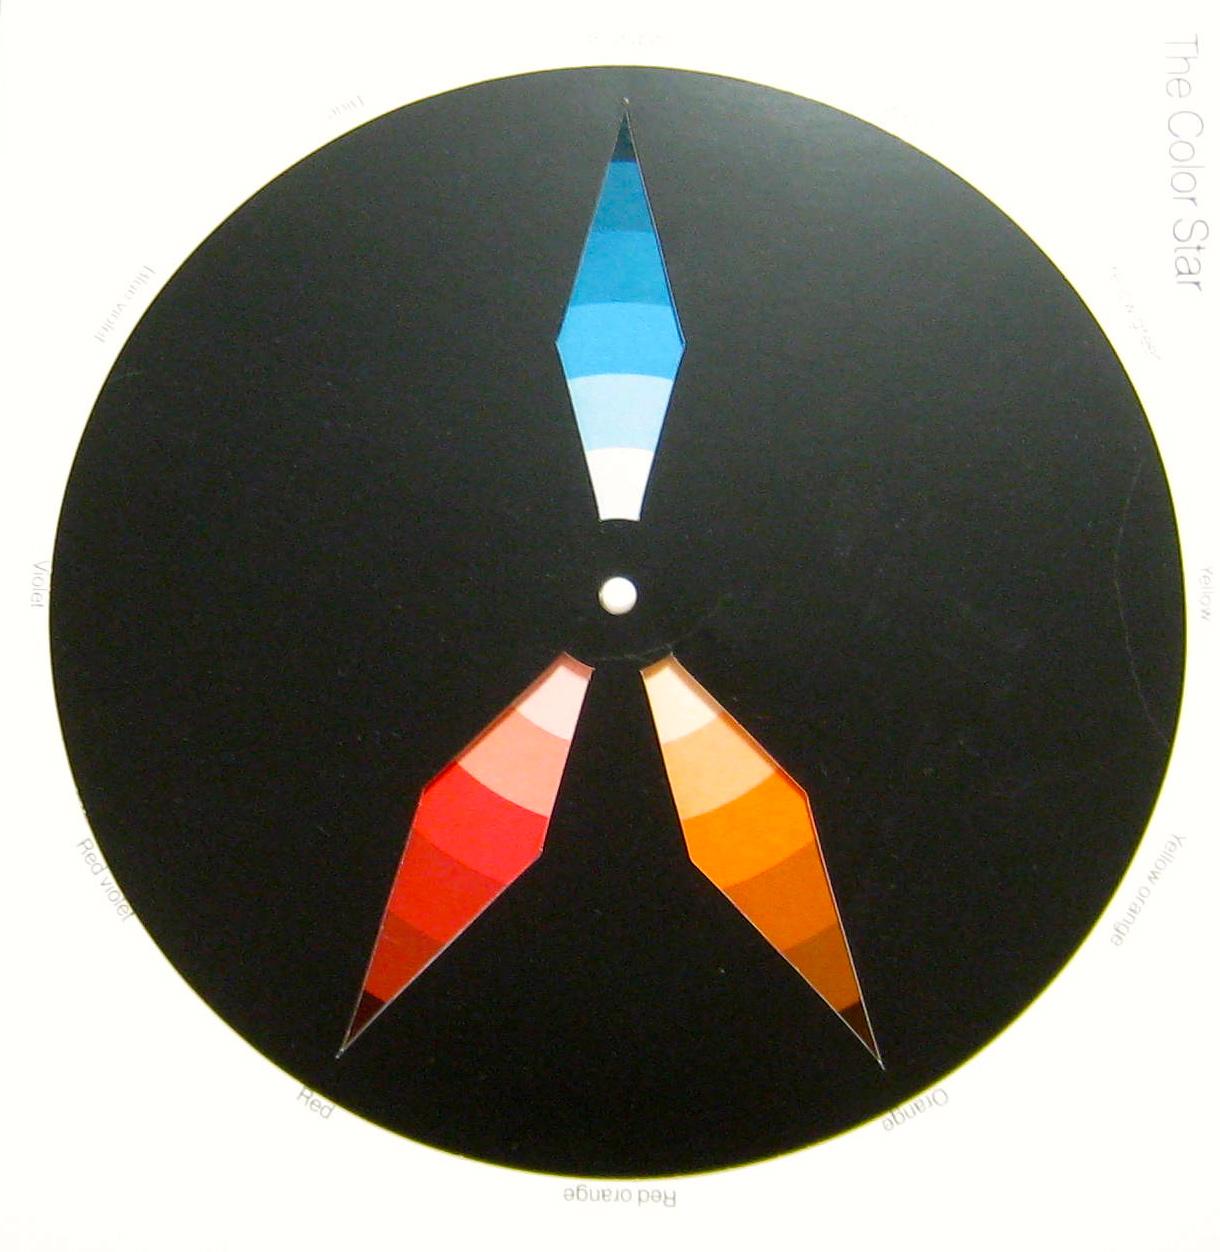 Split-complimentary colours